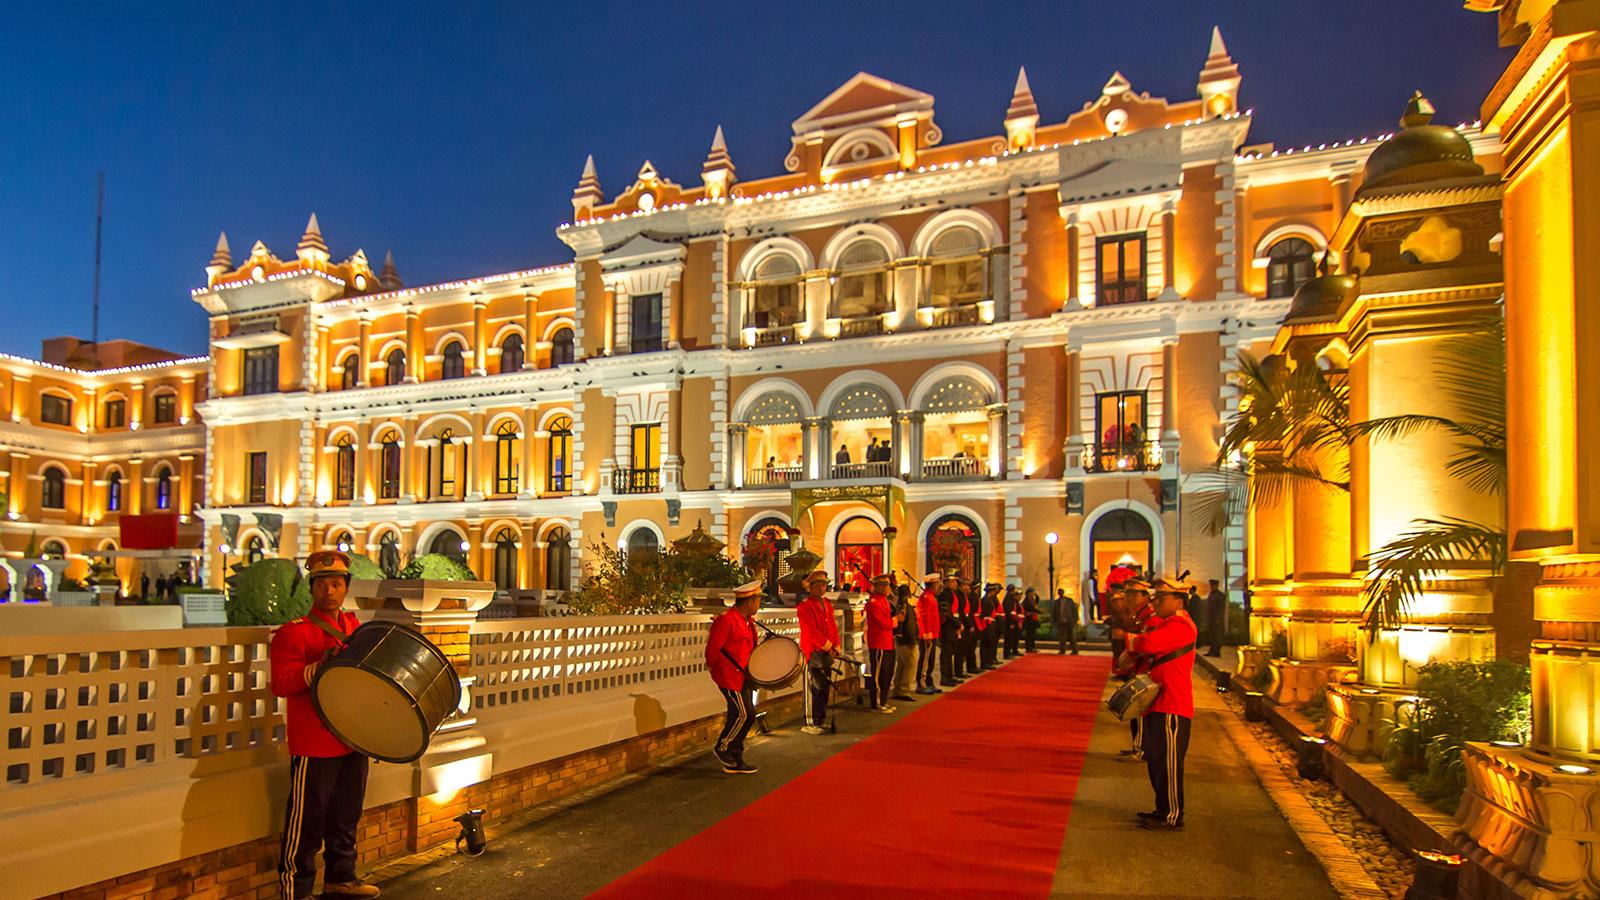 Hotel Yak  Yeti luxury 5 Star Hotel in Kathmandu Nepal